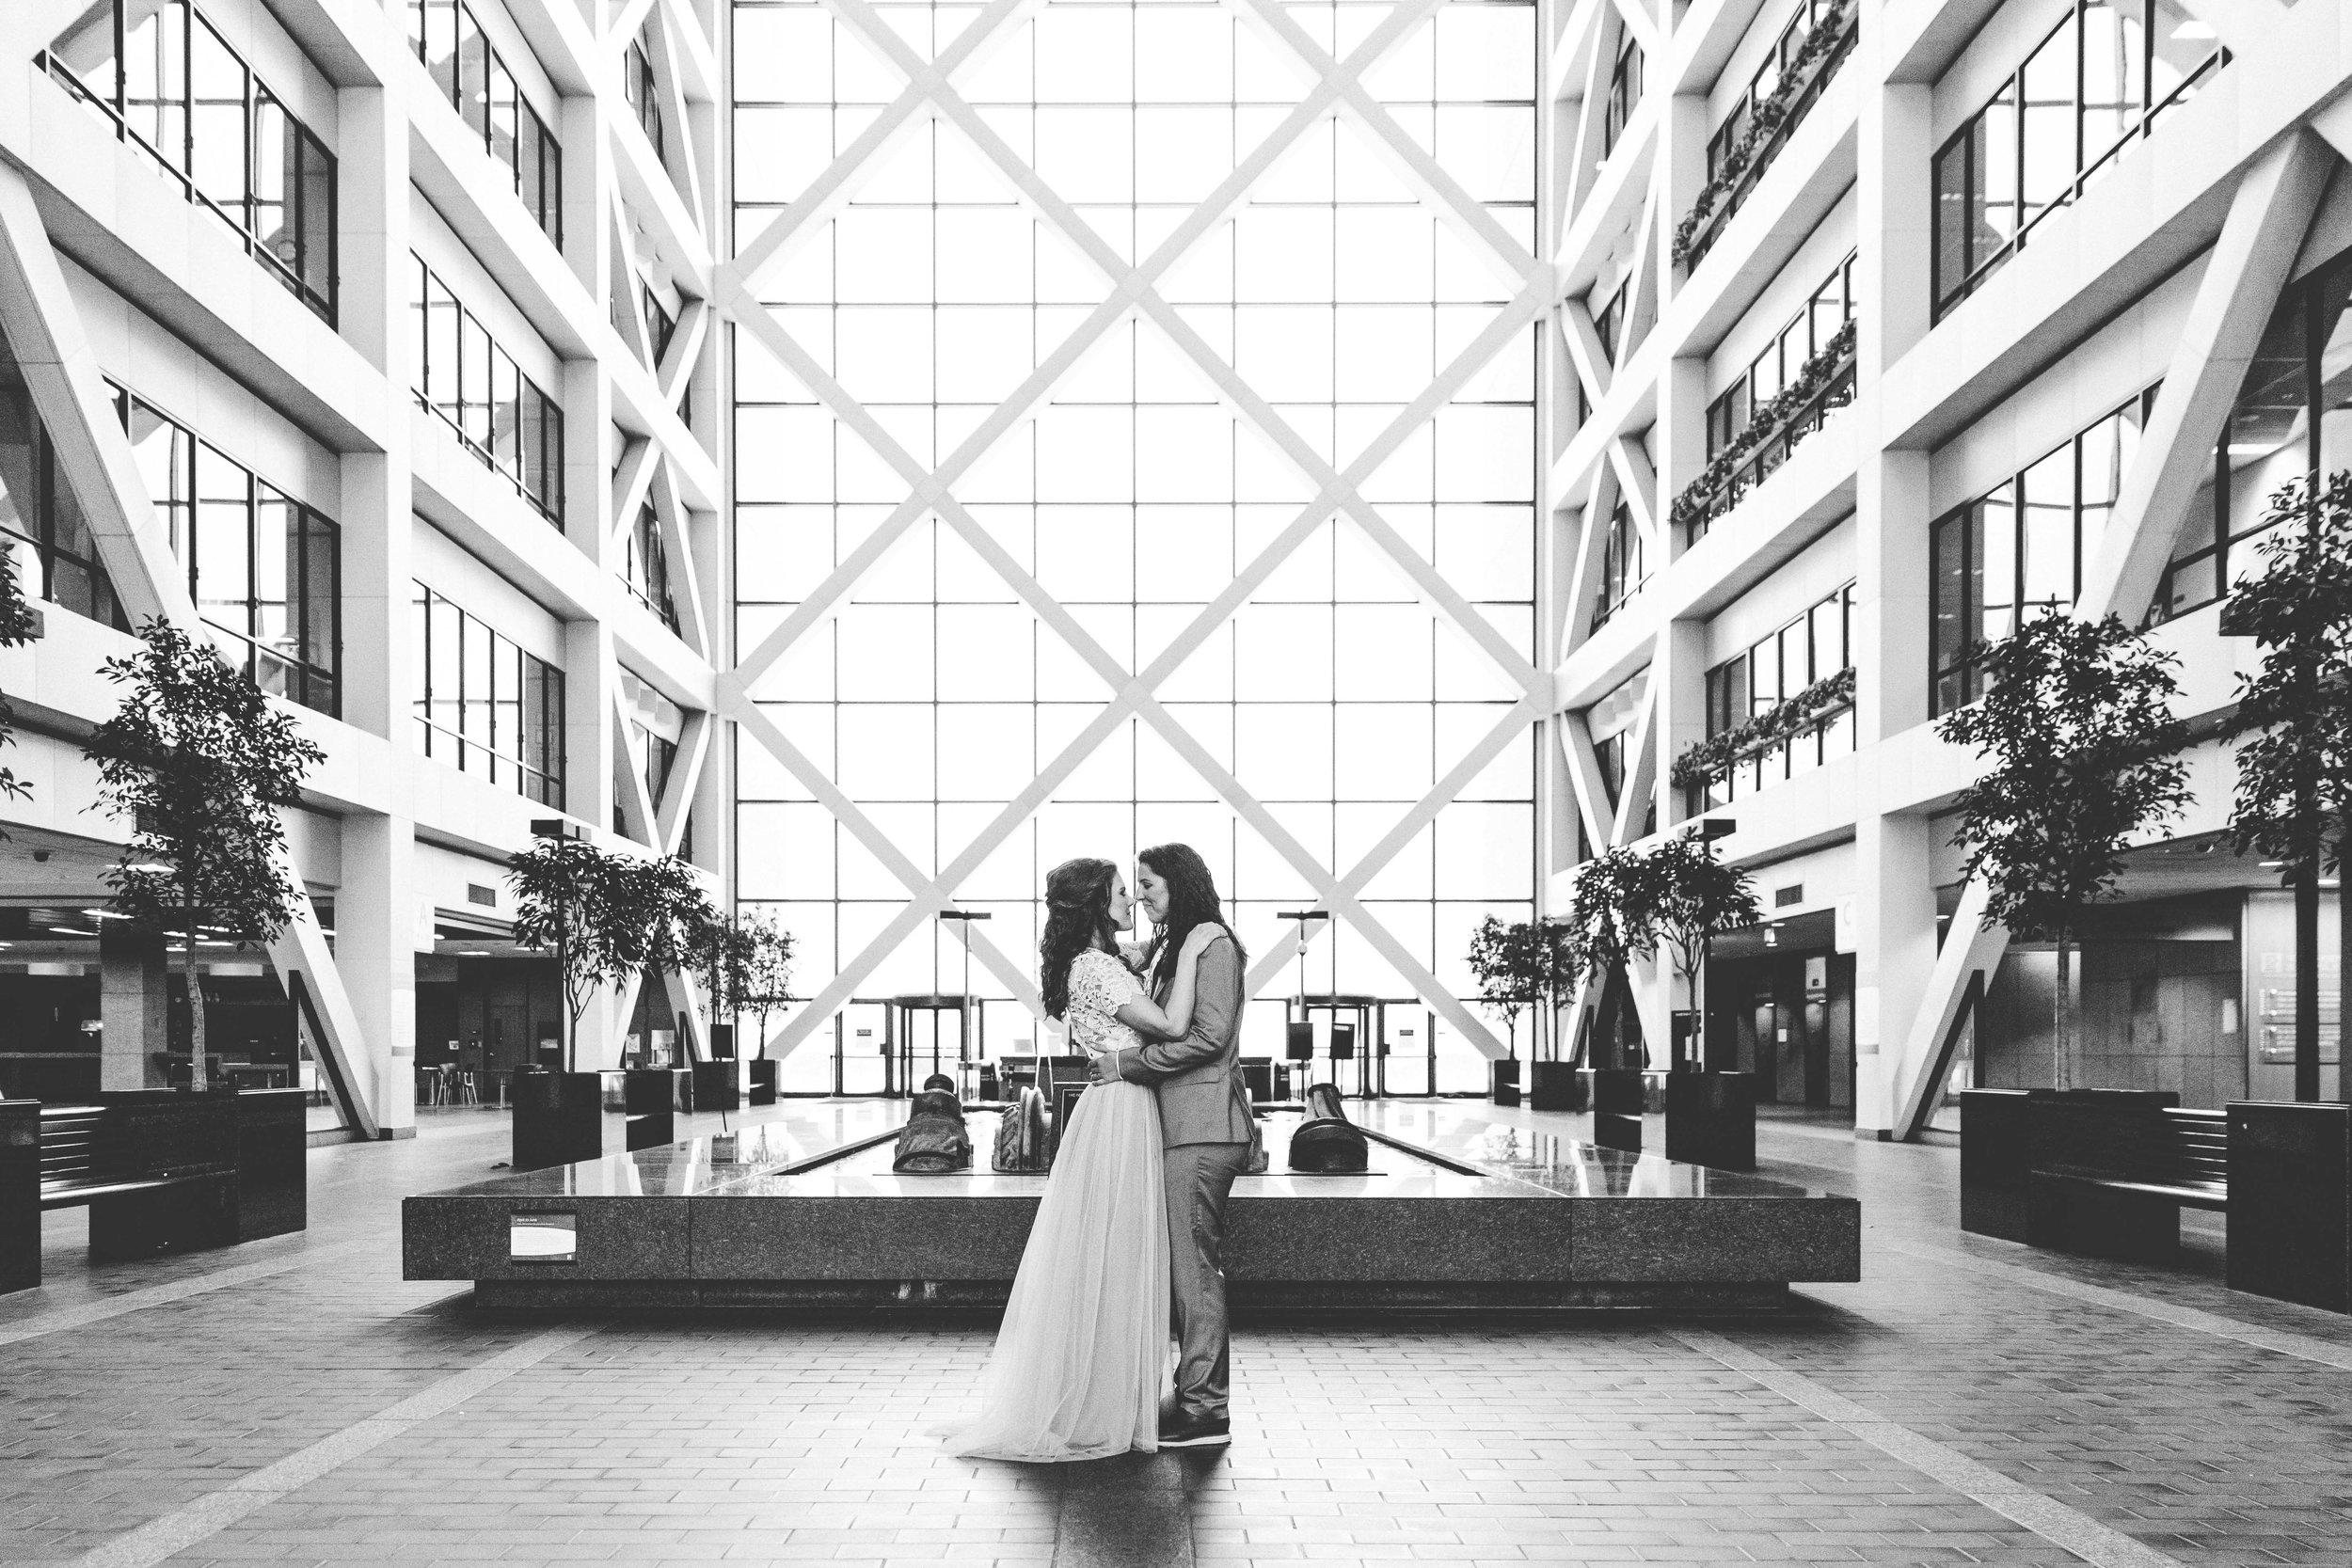 cnp2018-Morgan&Natalie-0007_bw.jpg